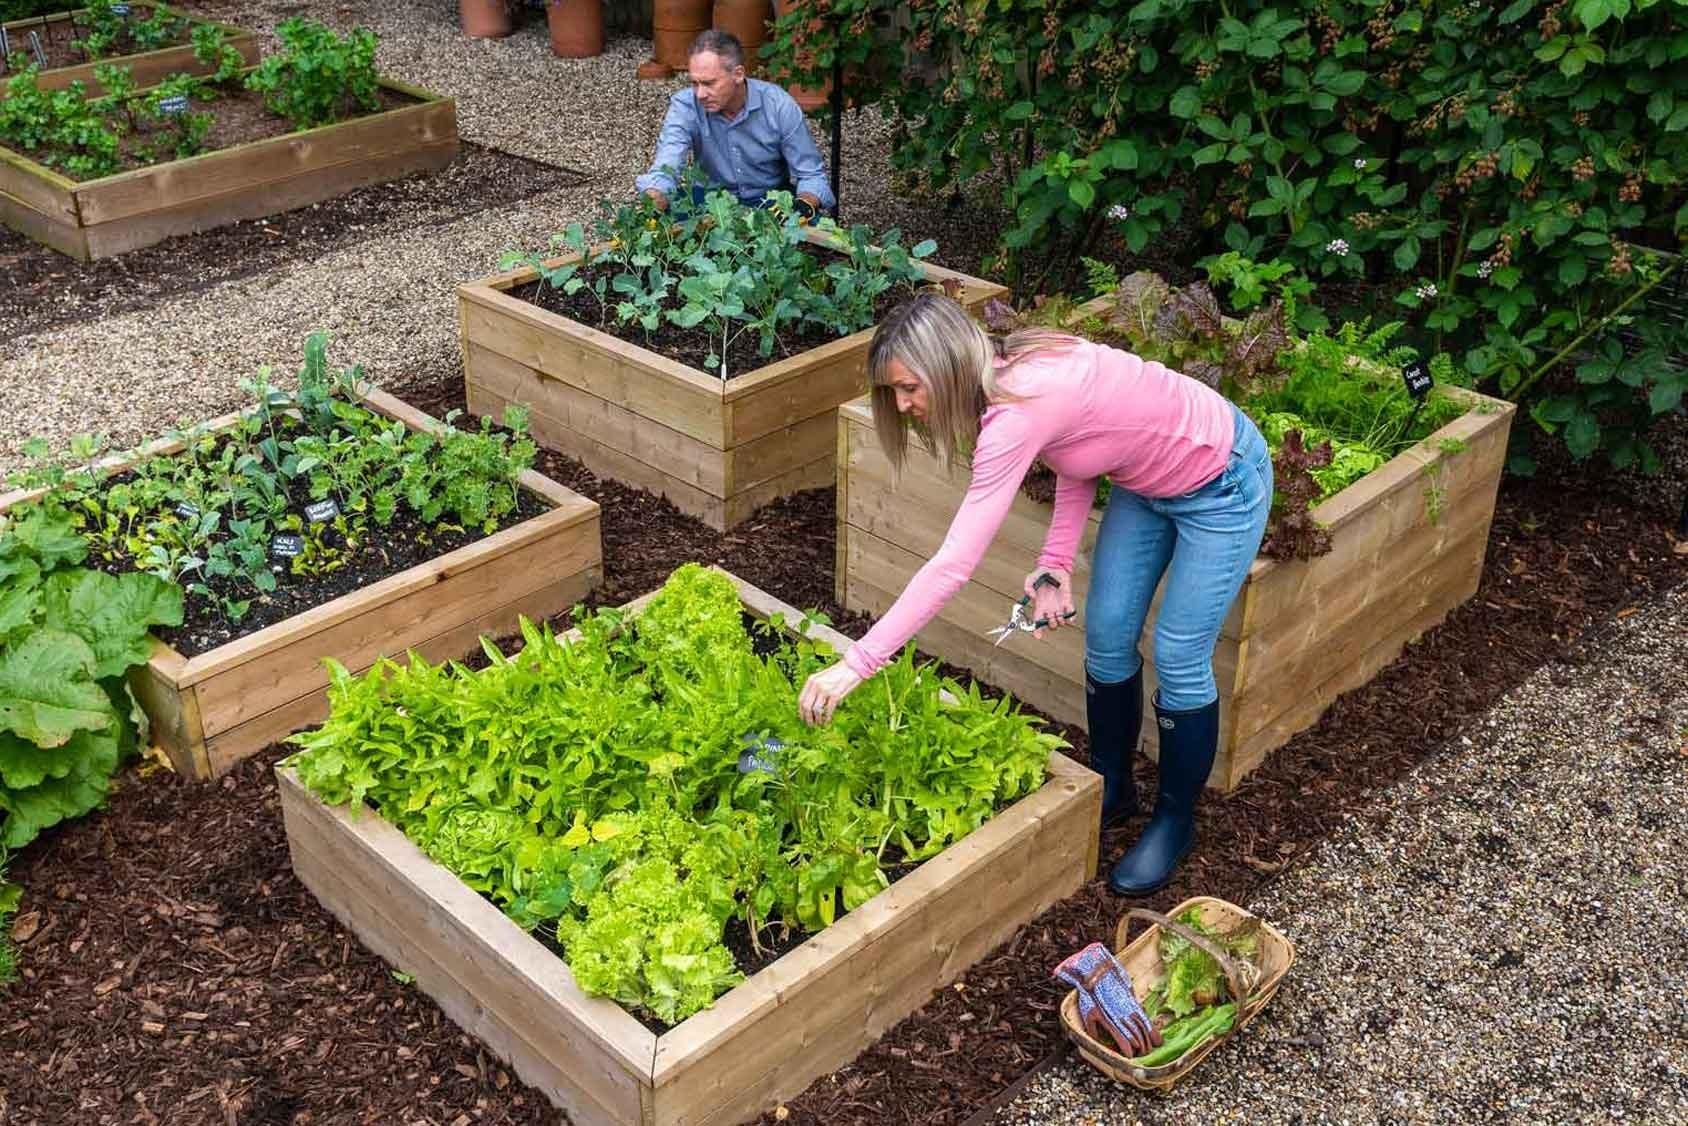 Standard Wooden Raised Beds Harrod Horticultural